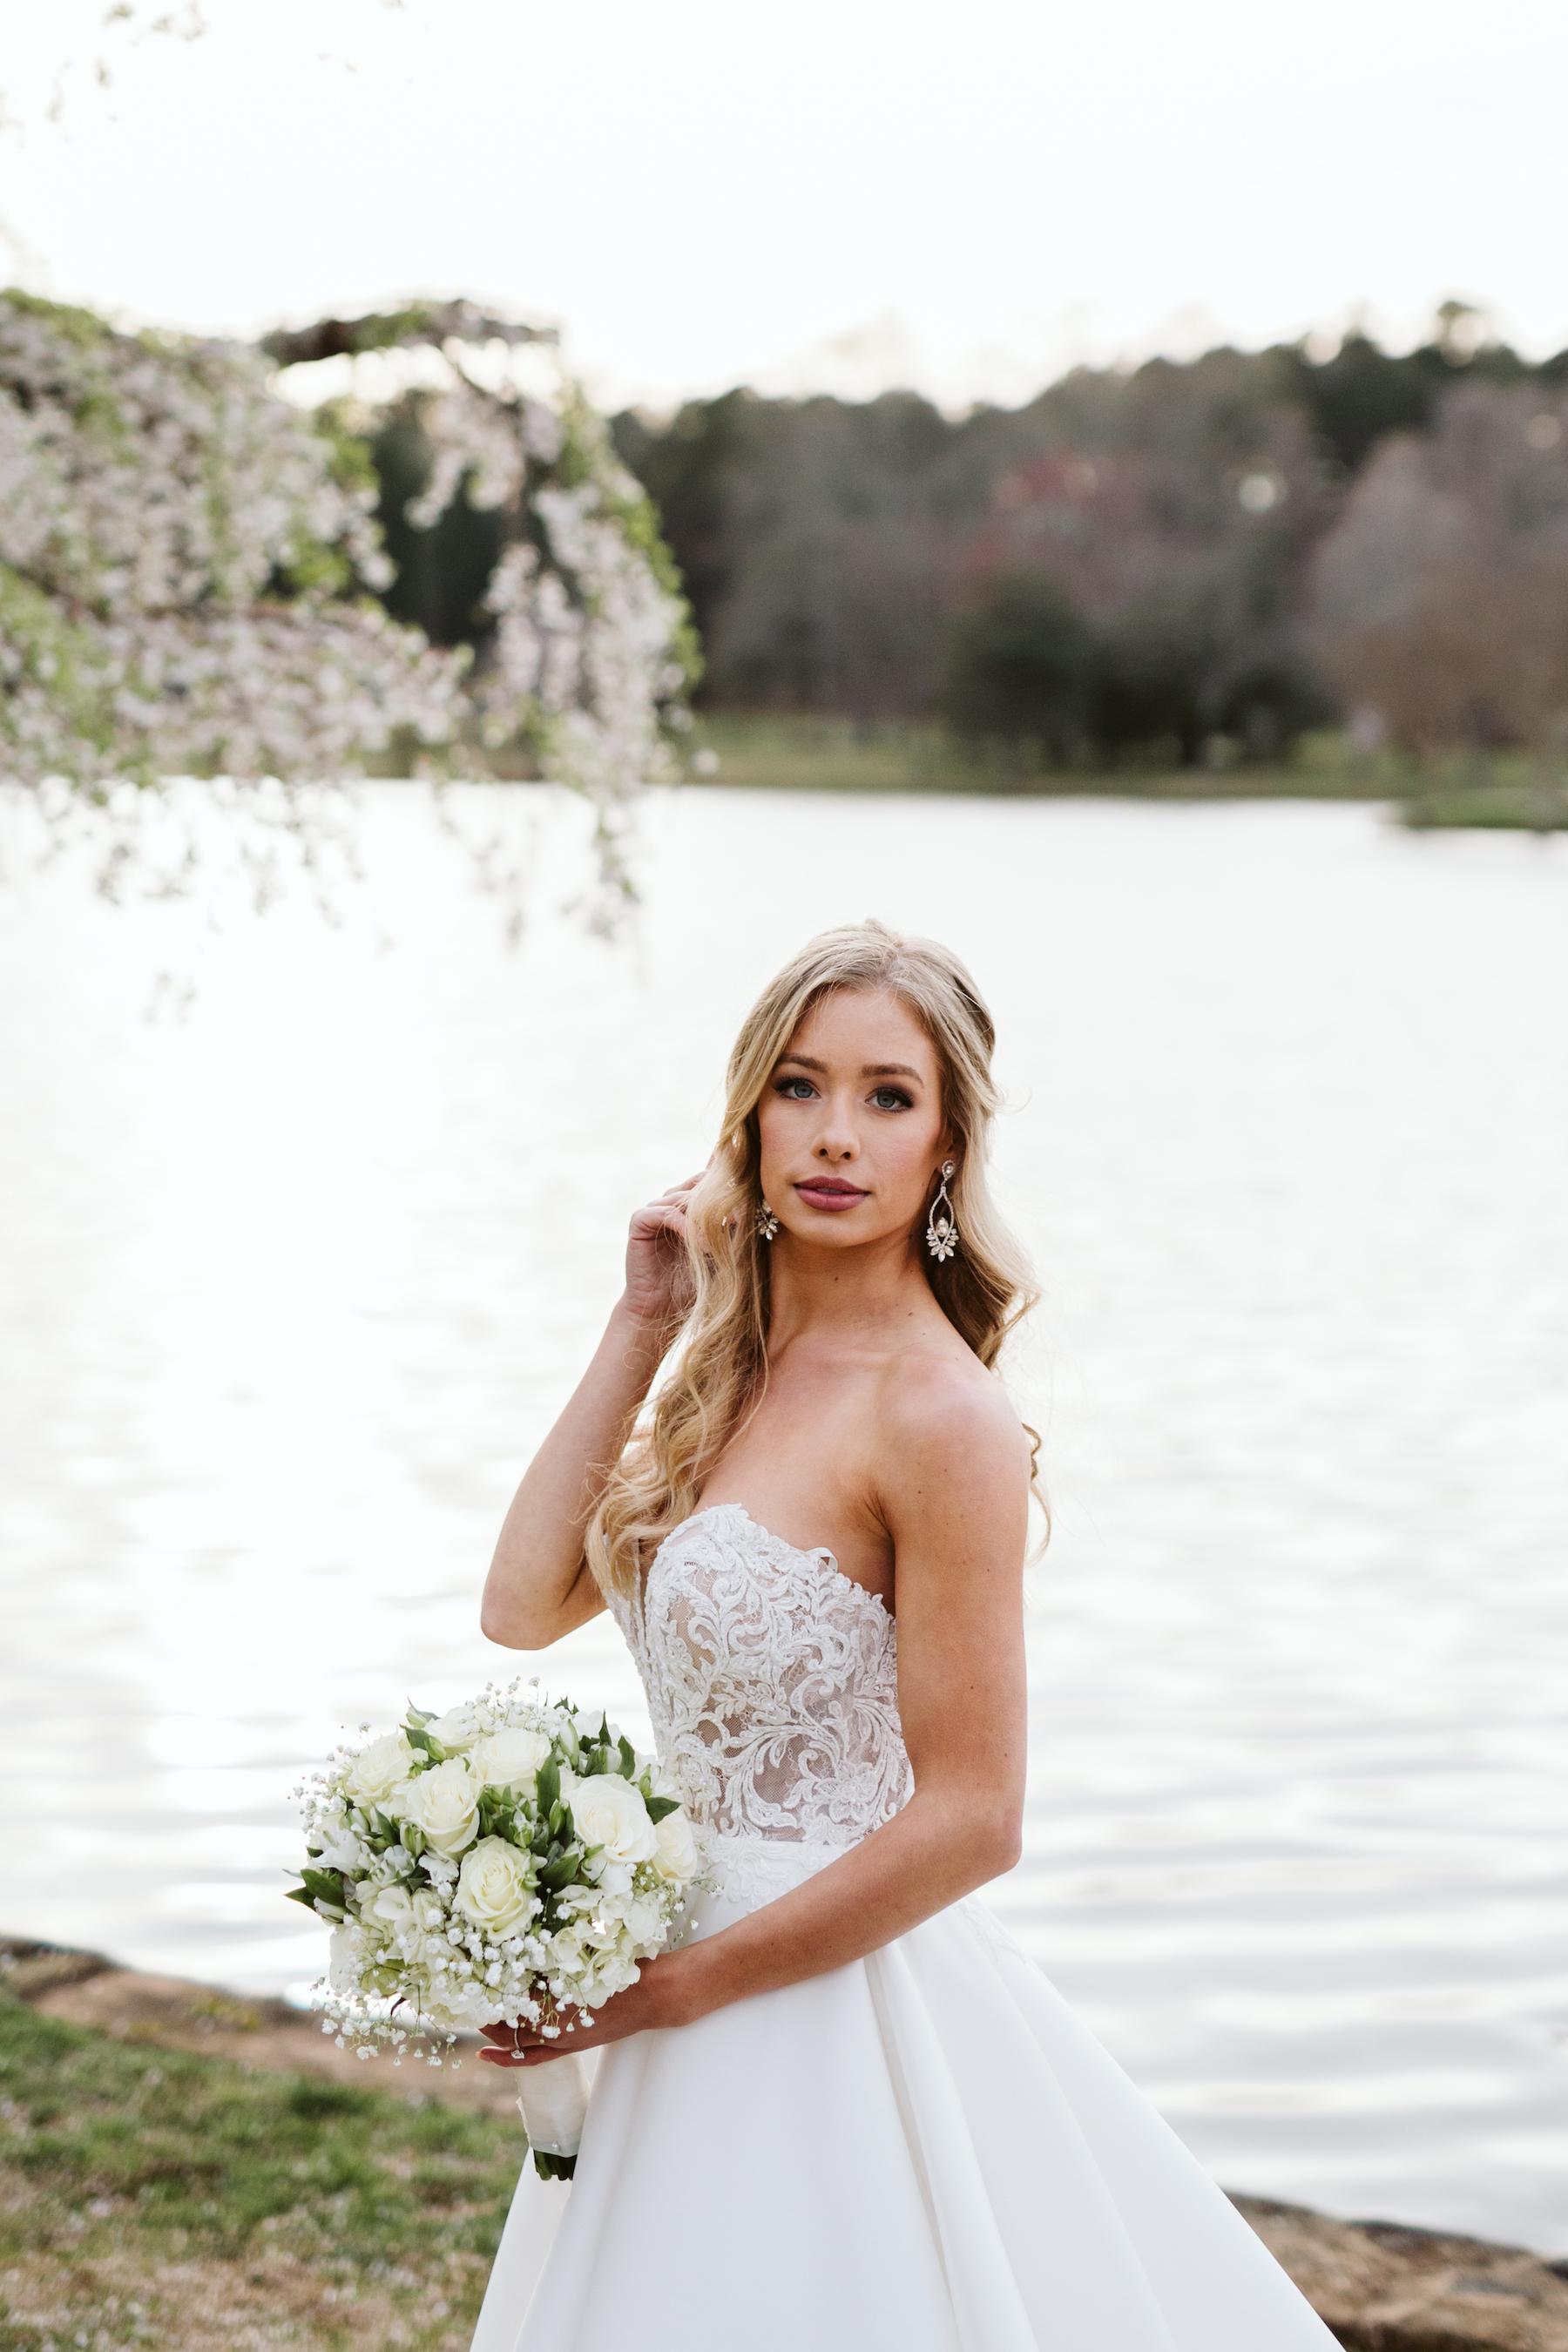 furman-university-bridals-paige-213.JPG